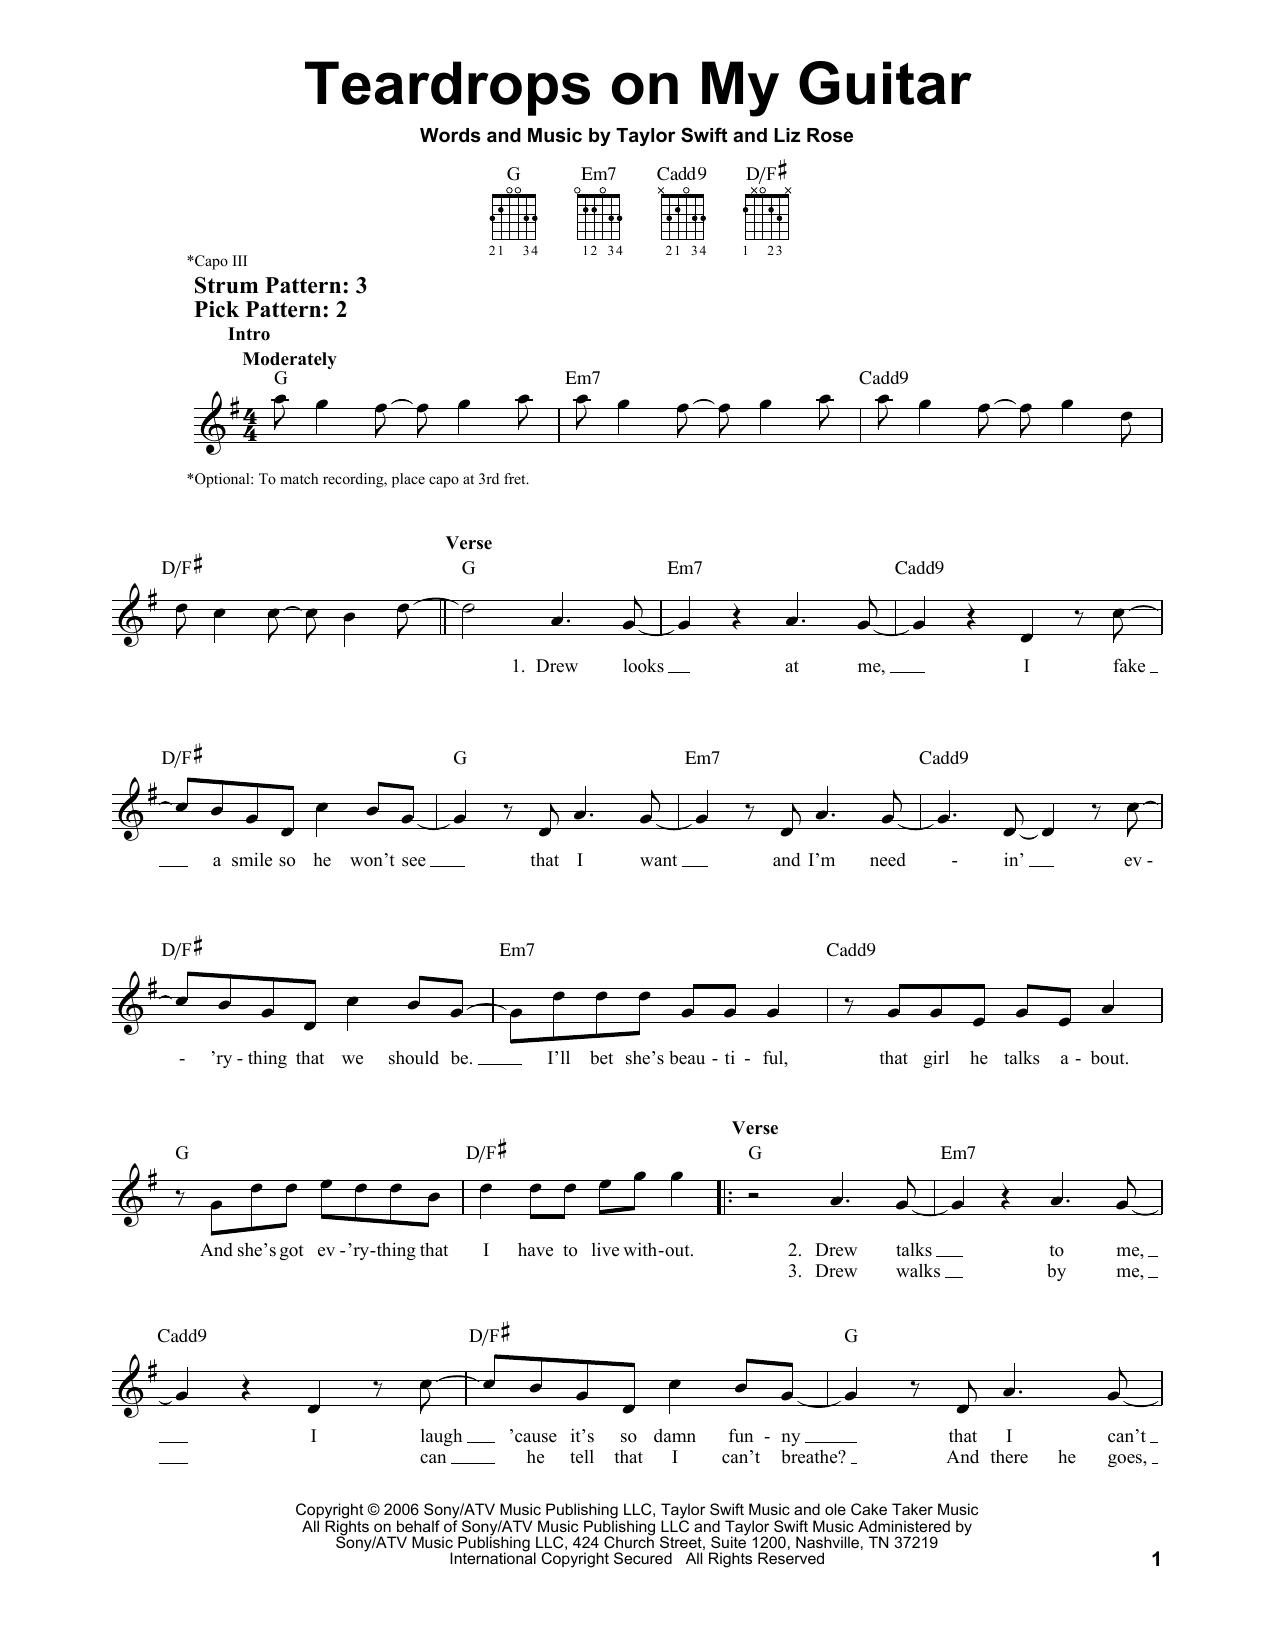 Teardrops On My Guitar Chords Taylor Swift Teardrops On My Guitar Sheet Music Notes Chords Download Printable Easy Guitar Sku 156358